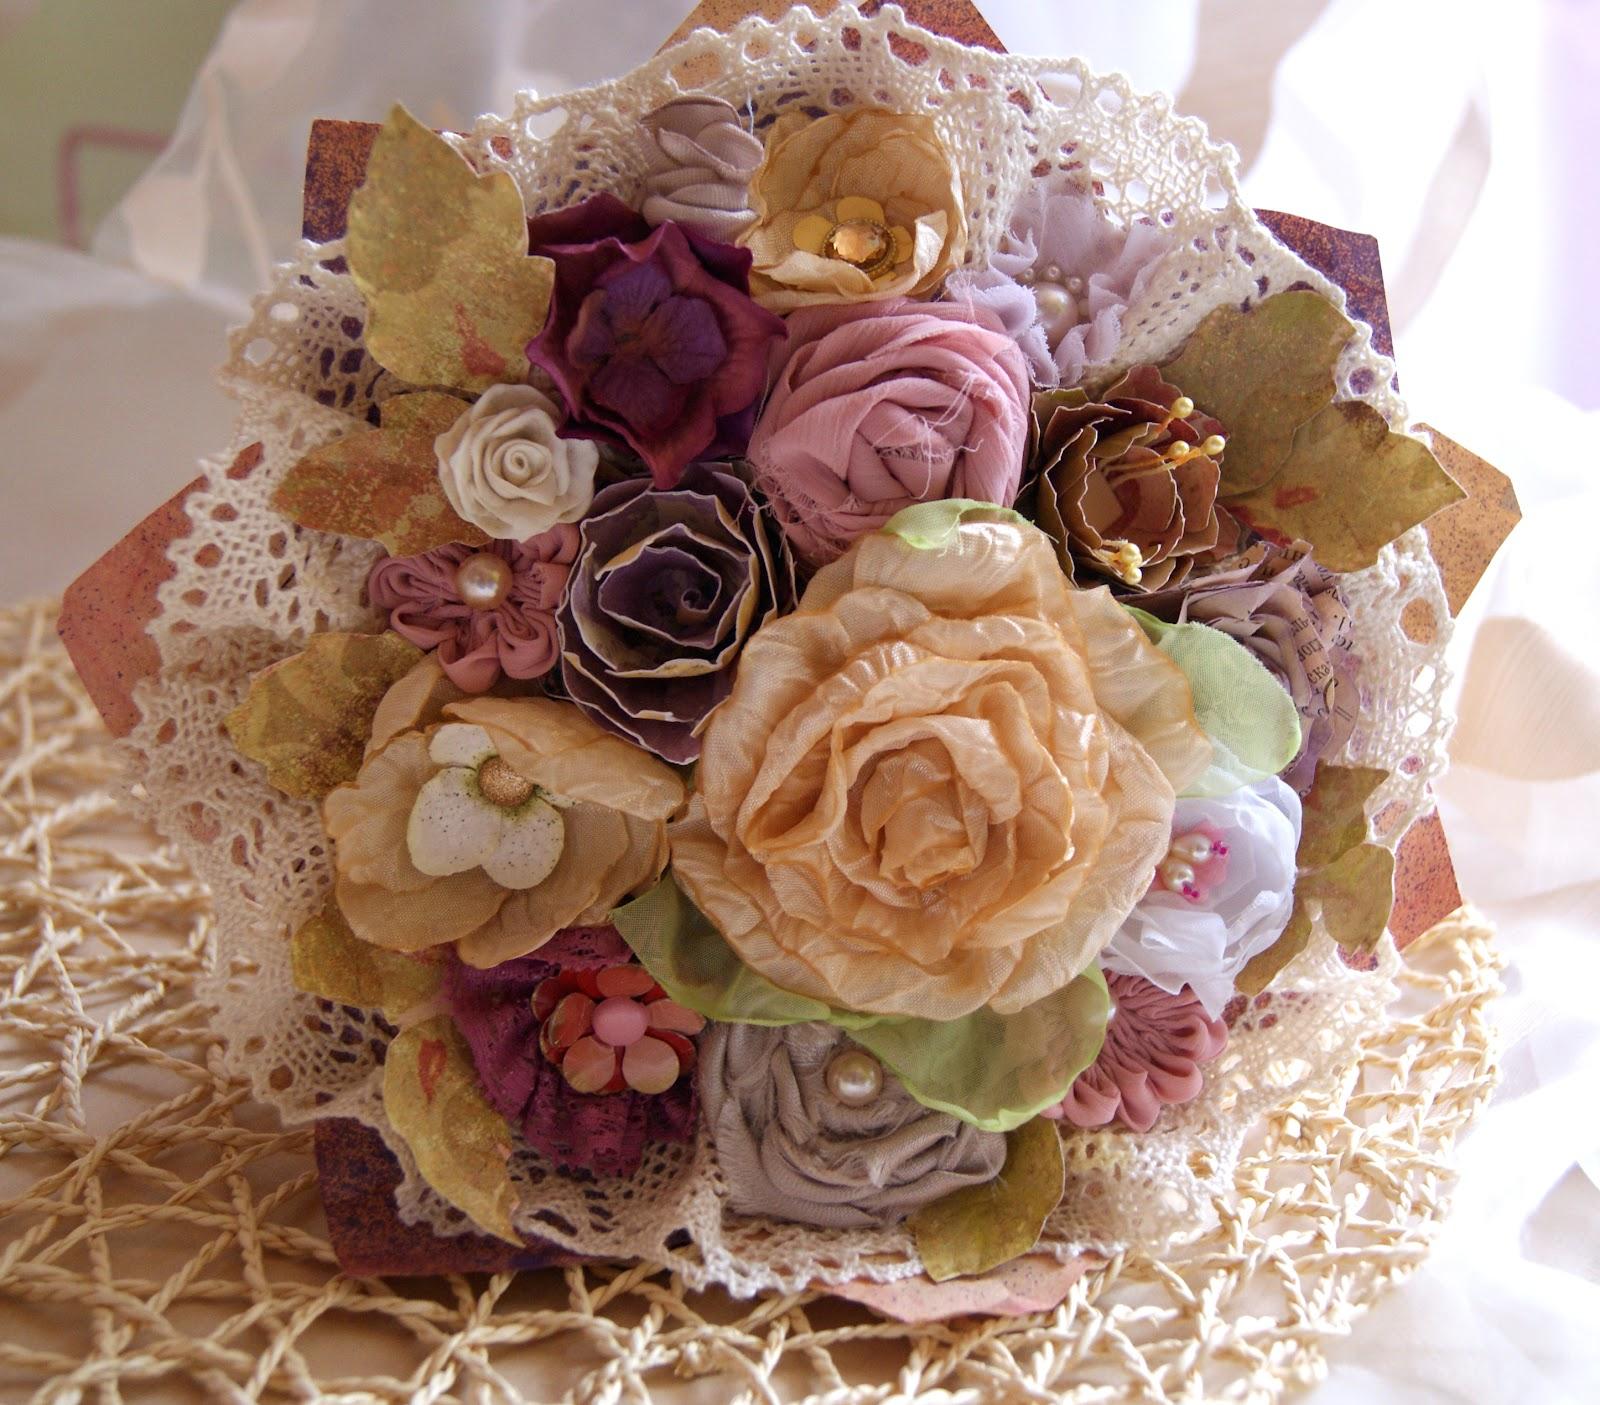 Композиция из цветов из ткани фото